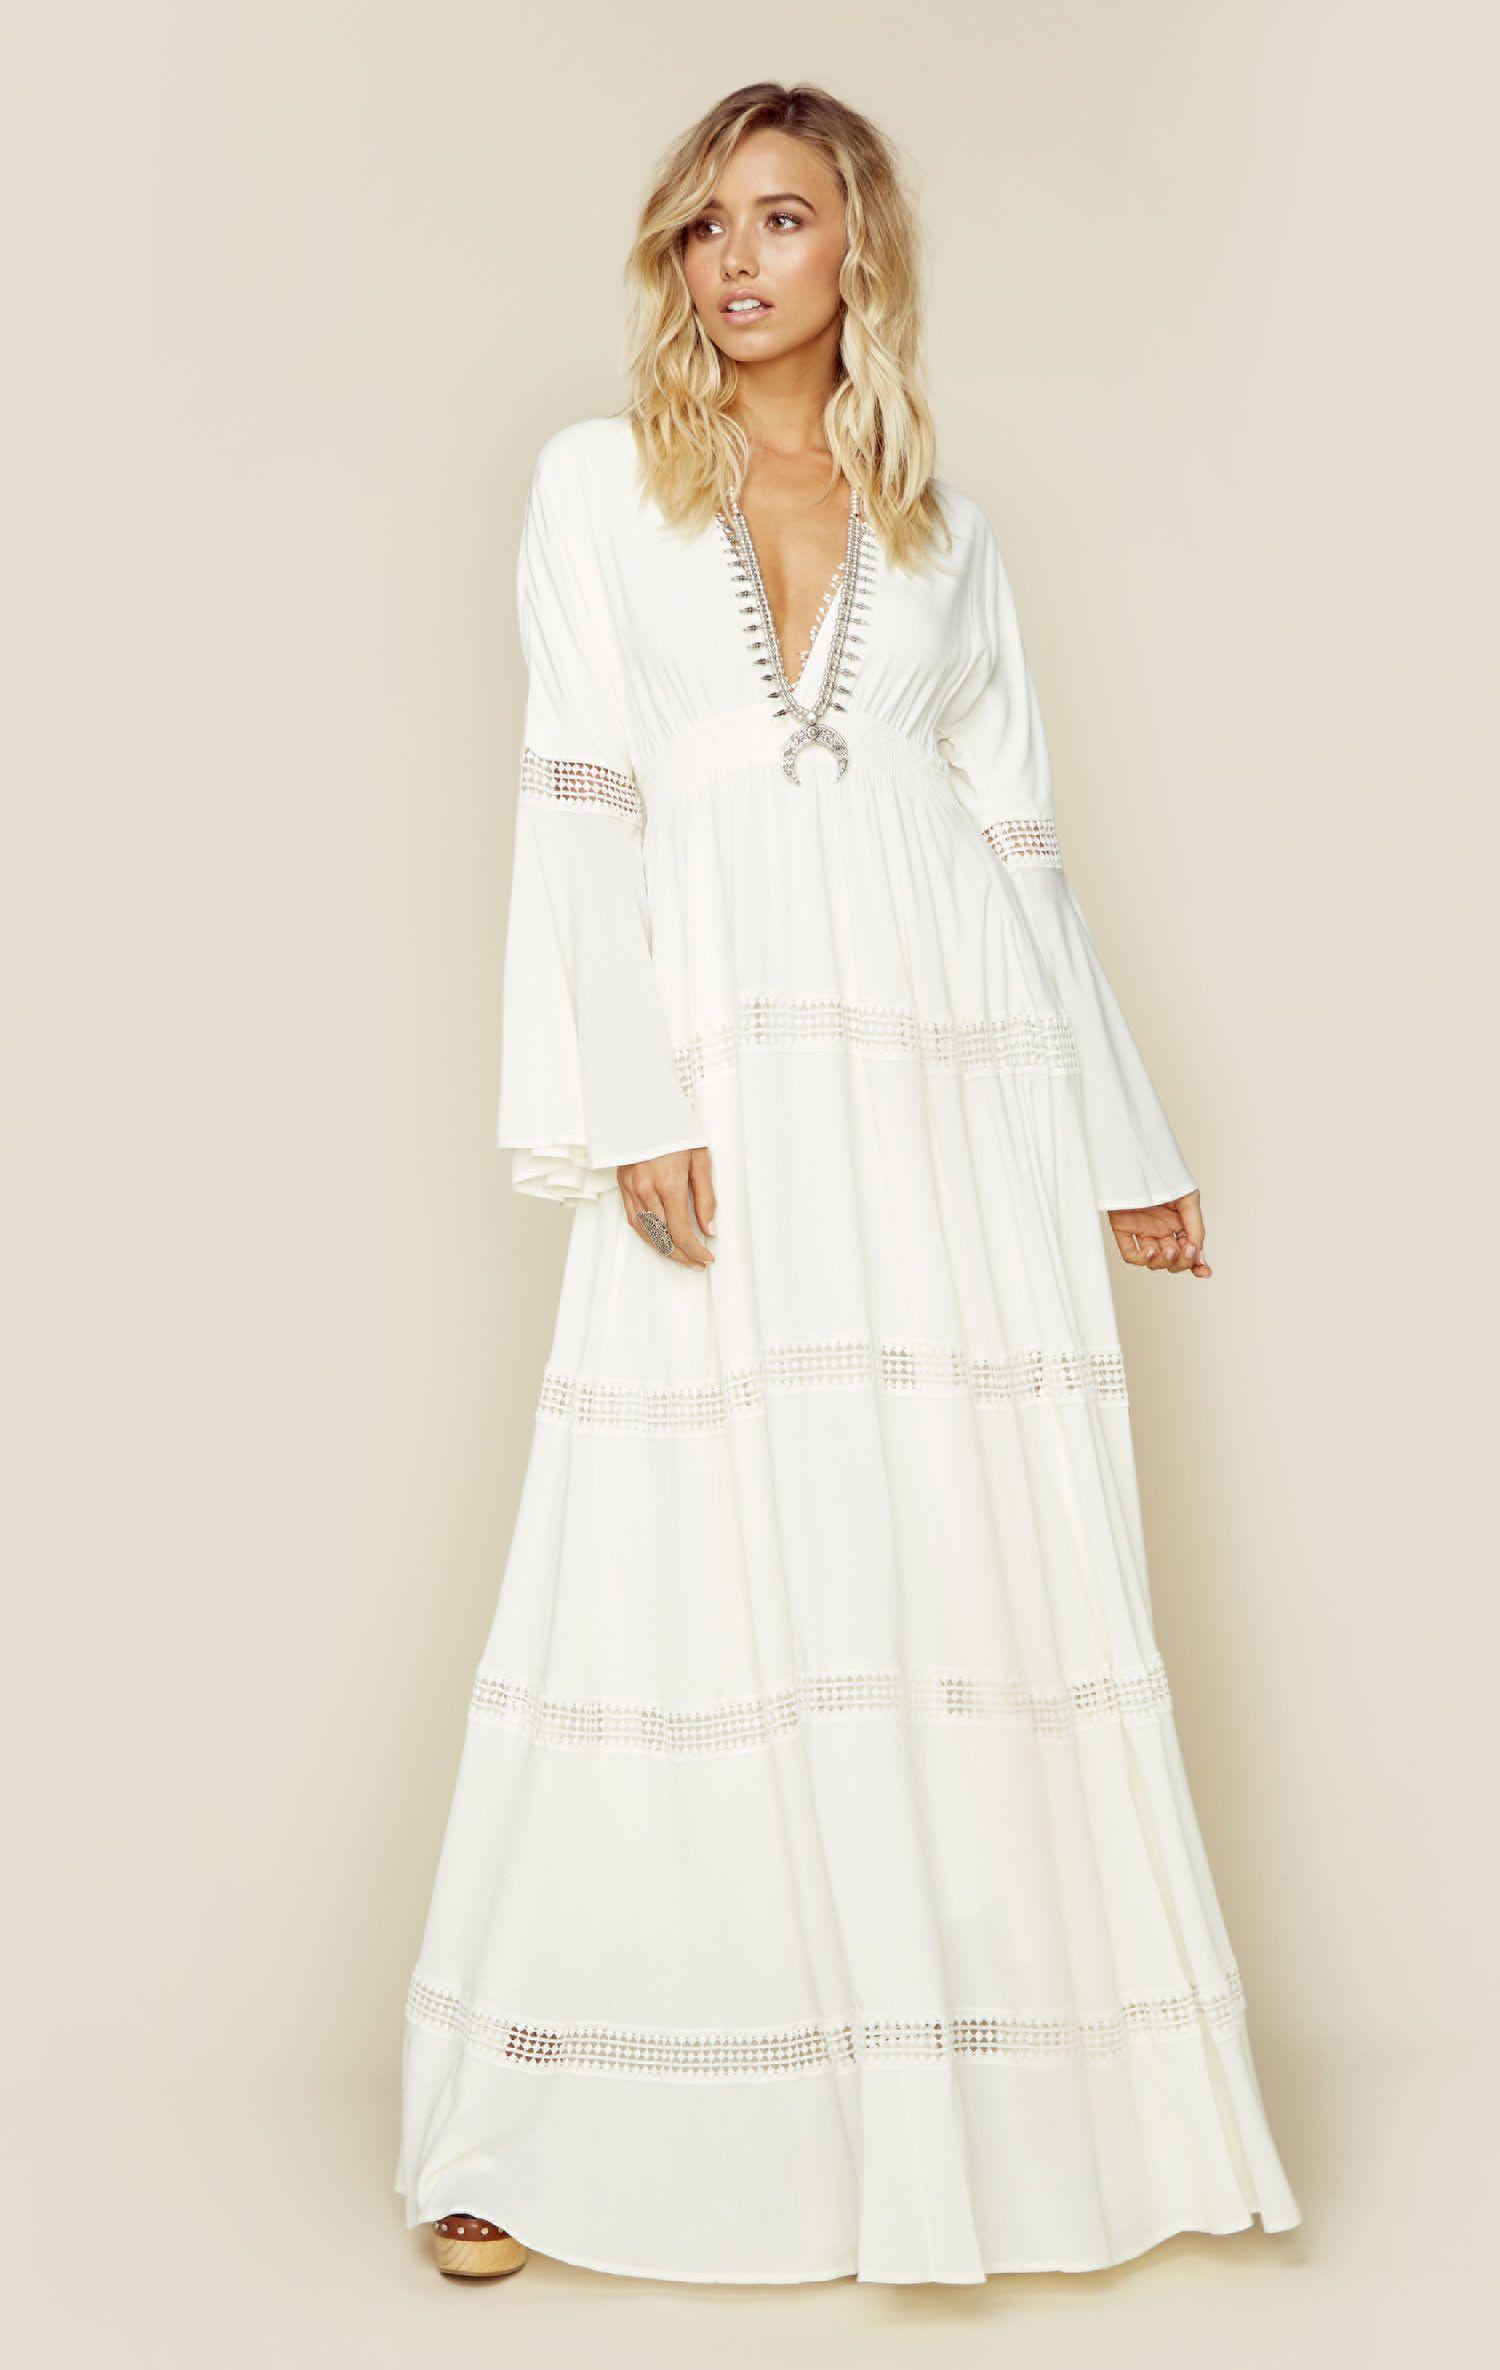 Hammock maxi dress full length skirts plunging neckline and maxi